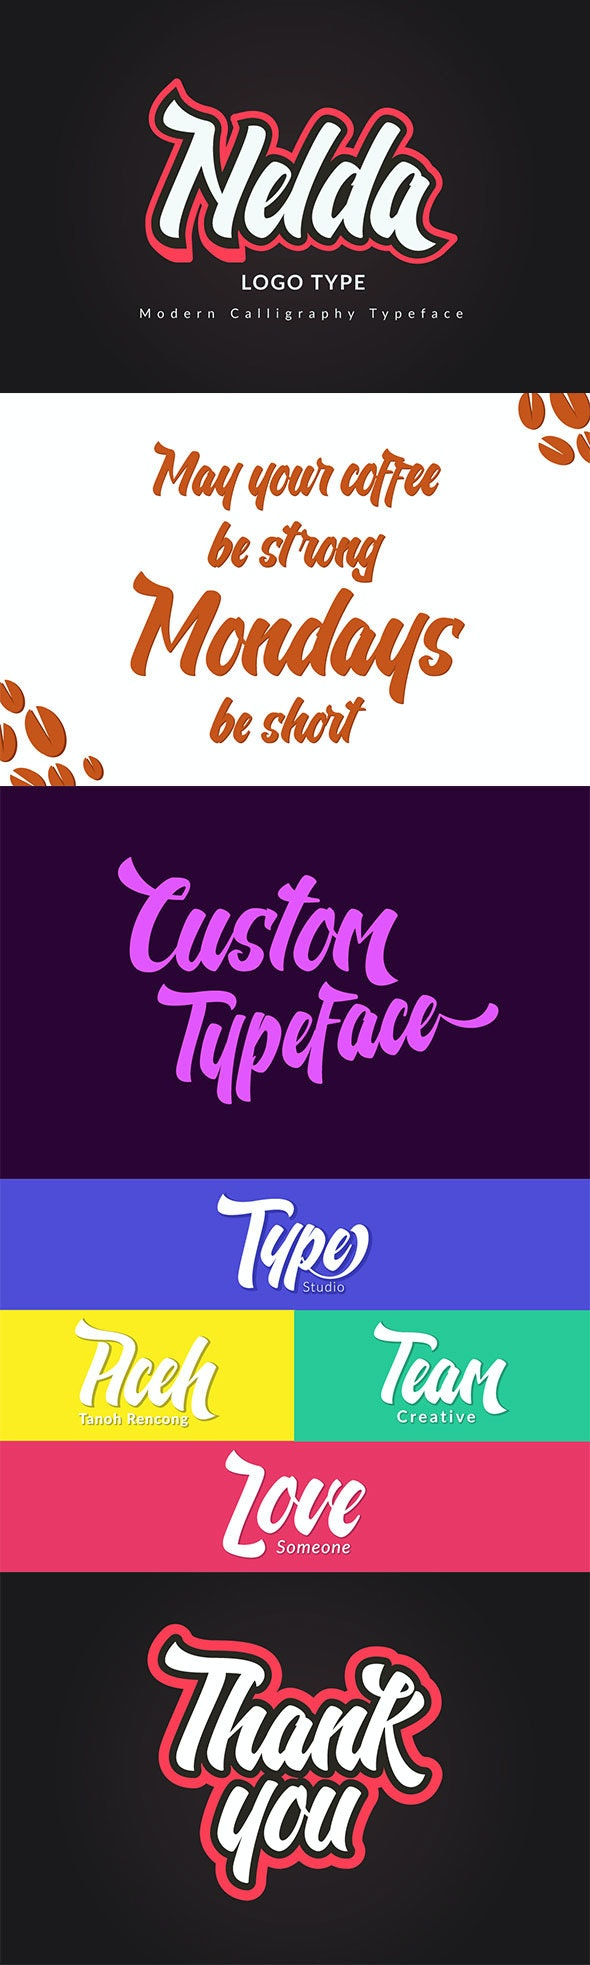 Nelda Typeface - Logo Type - Calligraphy Script